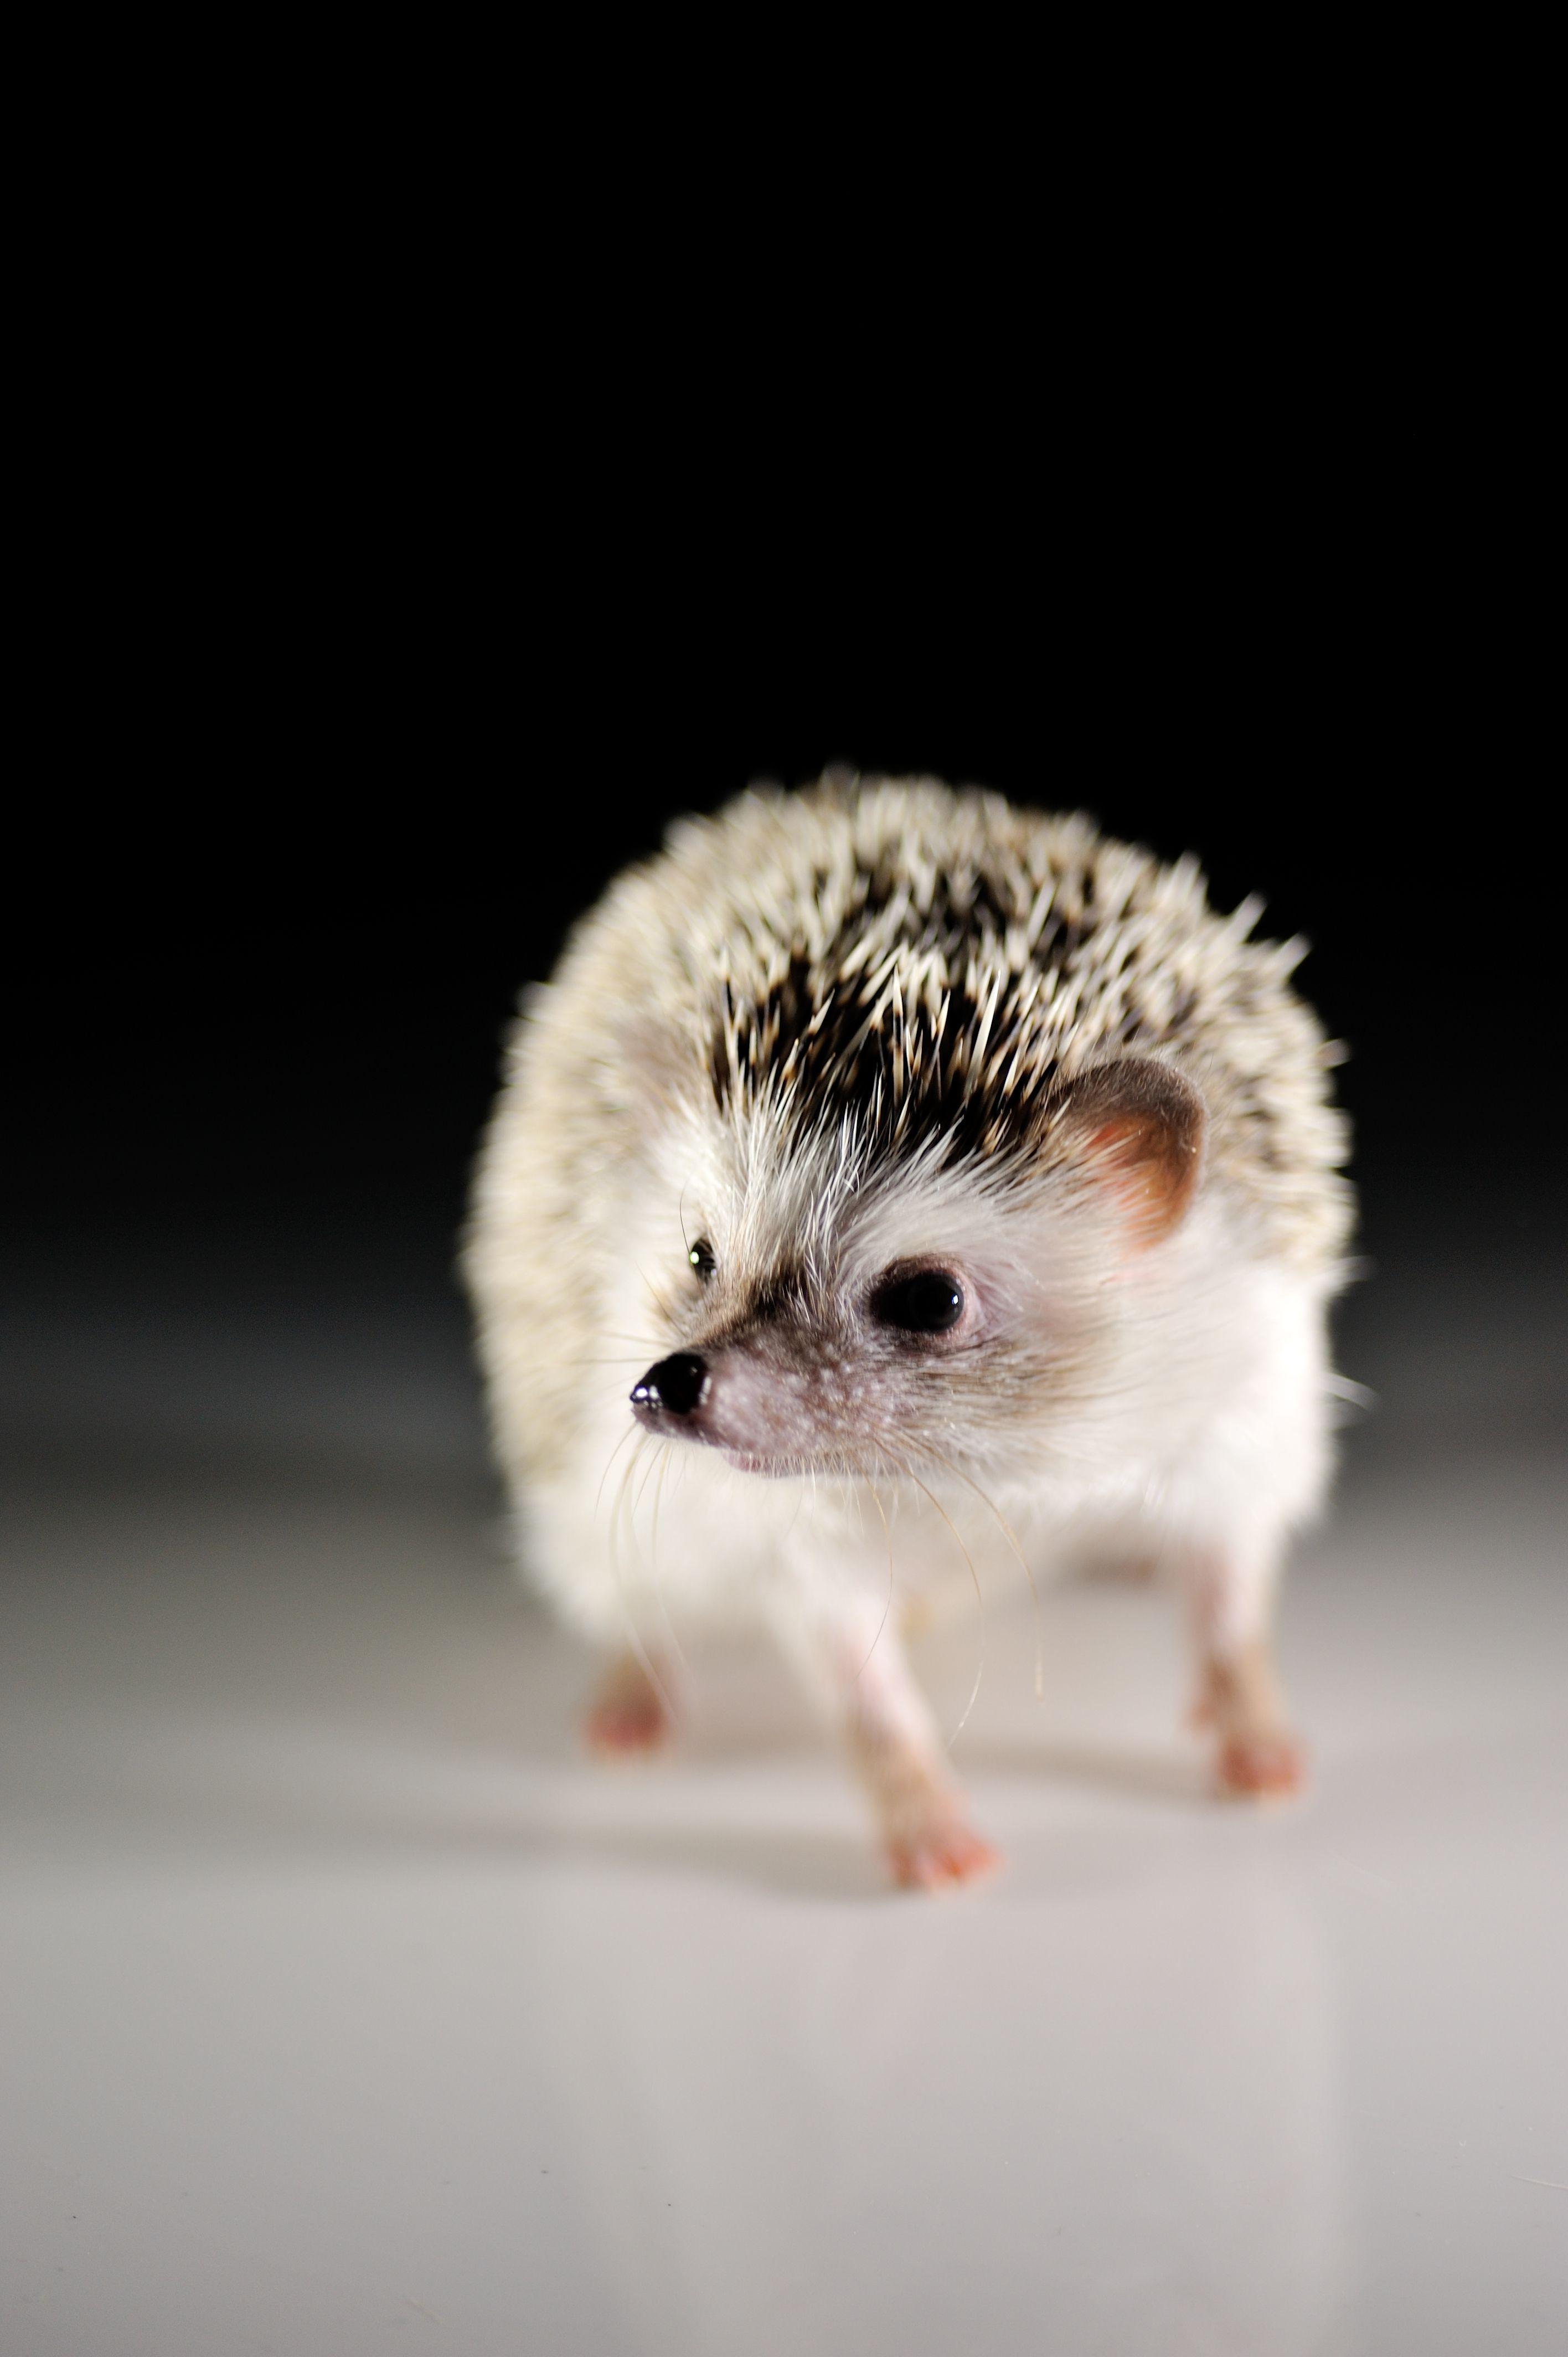 hedghog | Cute hedgehog, Animals and pets, Animals beautiful